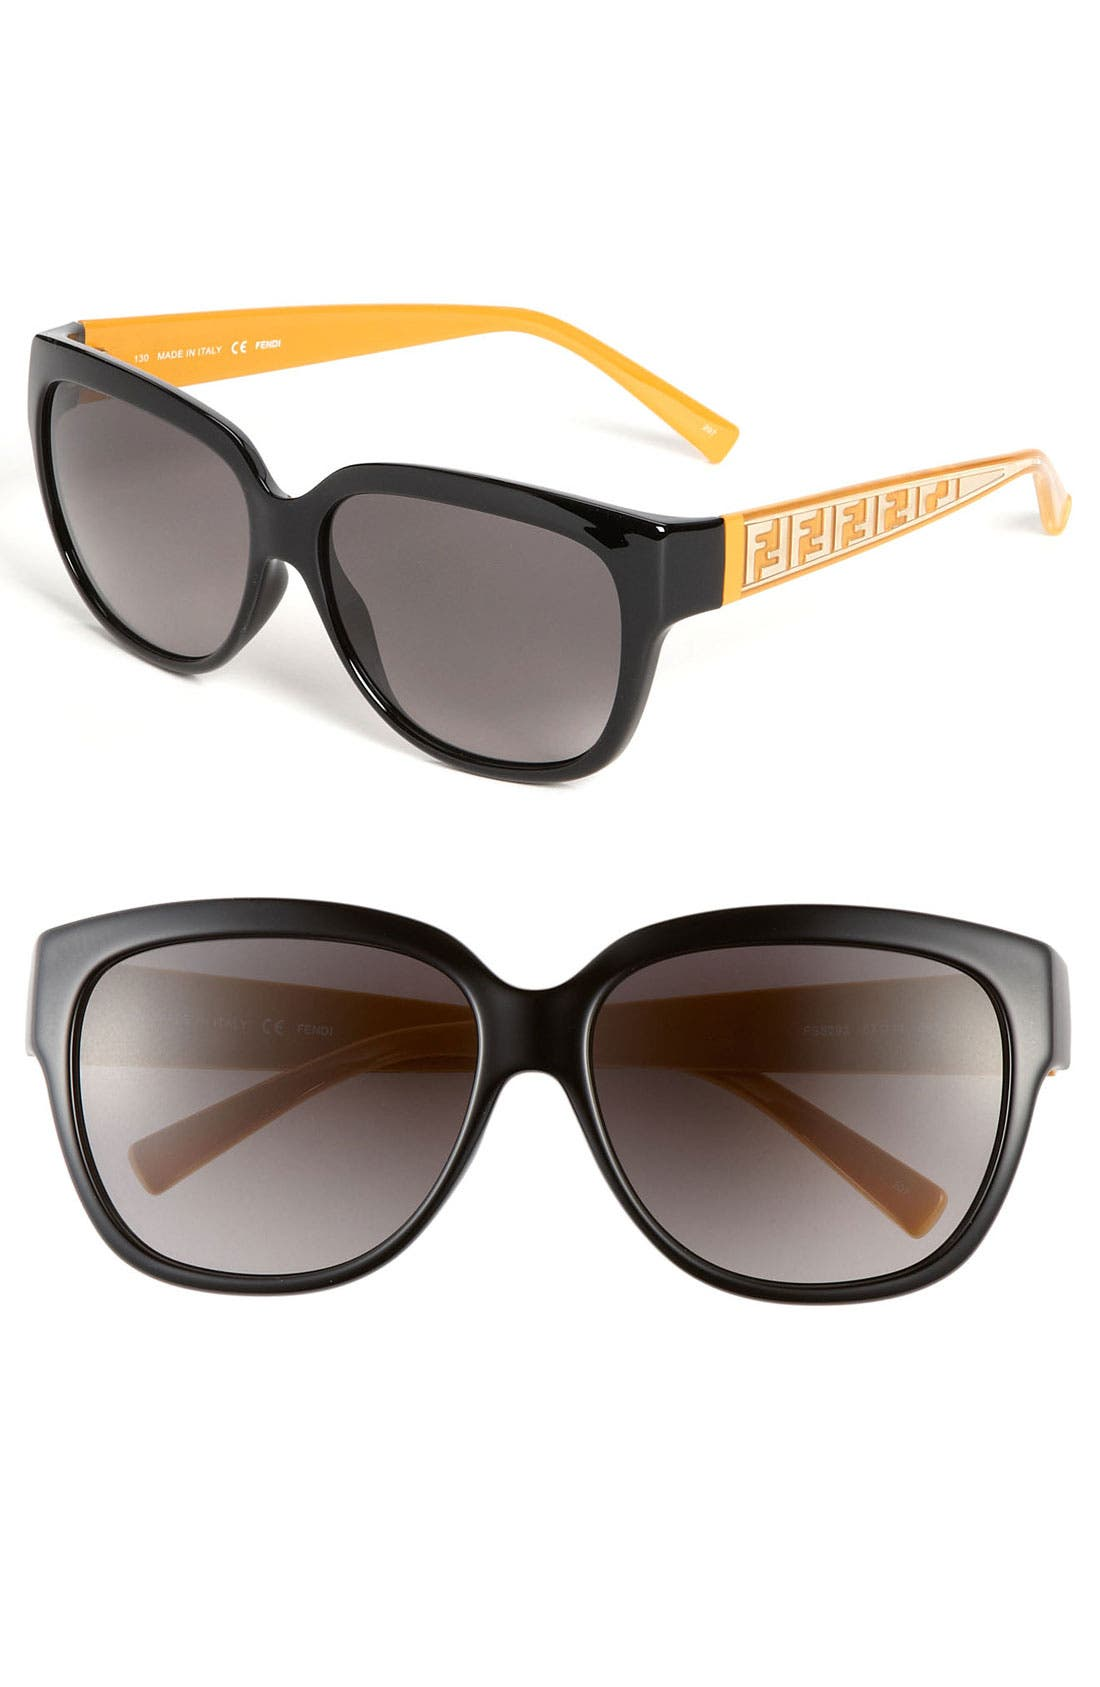 Main Image - Fendi 'Zucca' 57mm Sunglasses